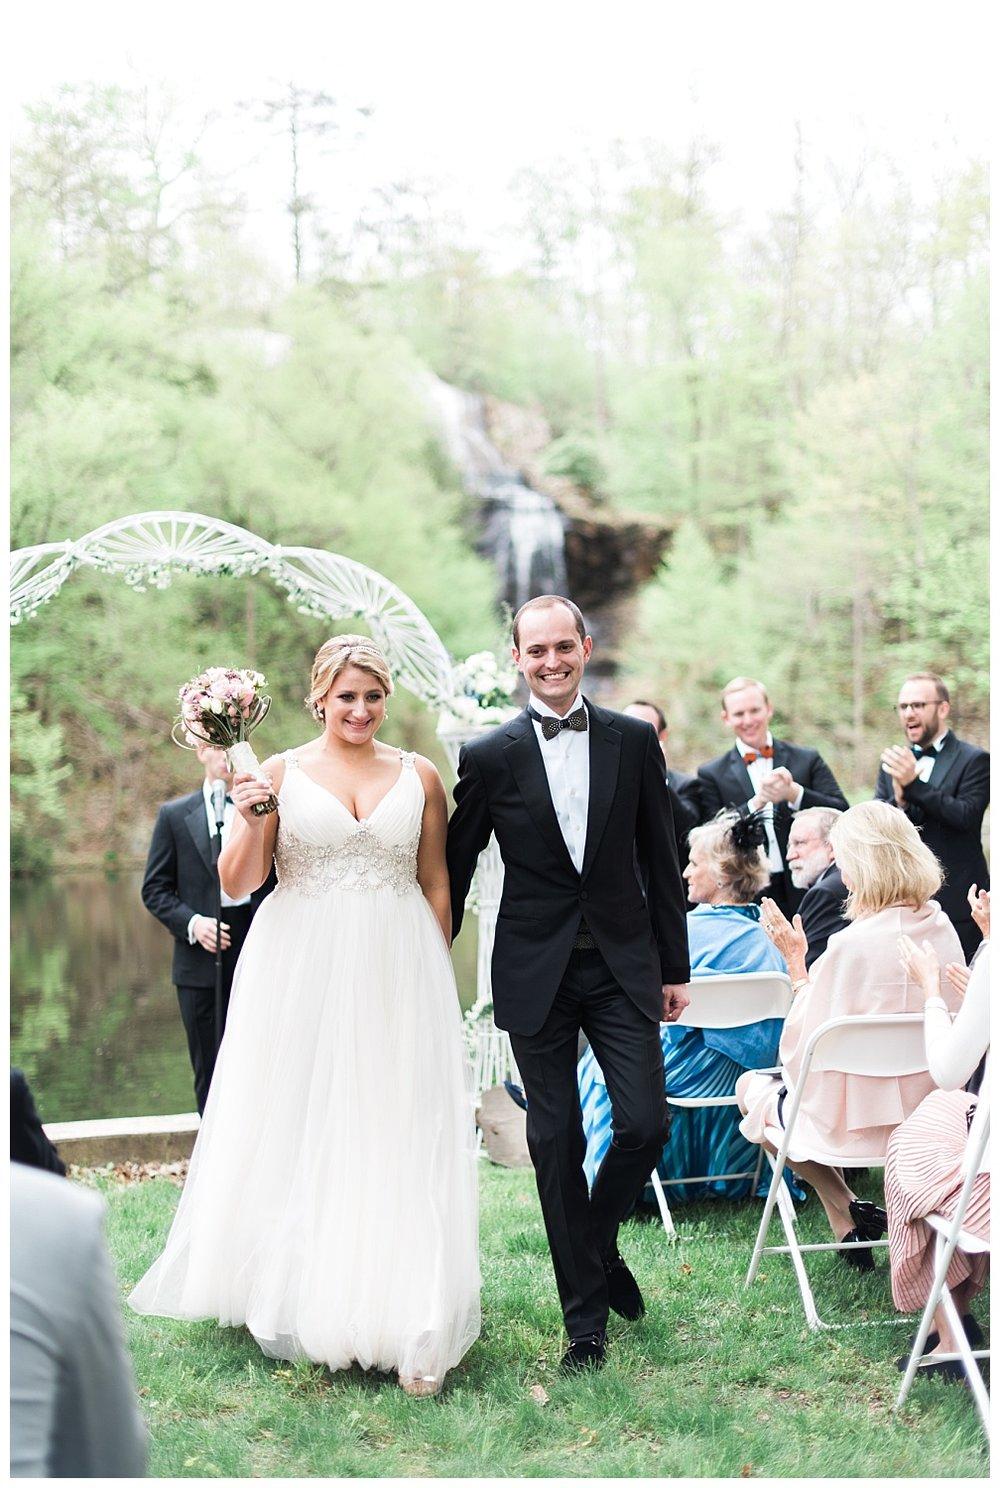 NJ-Andover-Hudson-Farm-Wedding-Outdoor-Photo-_0054.jpg